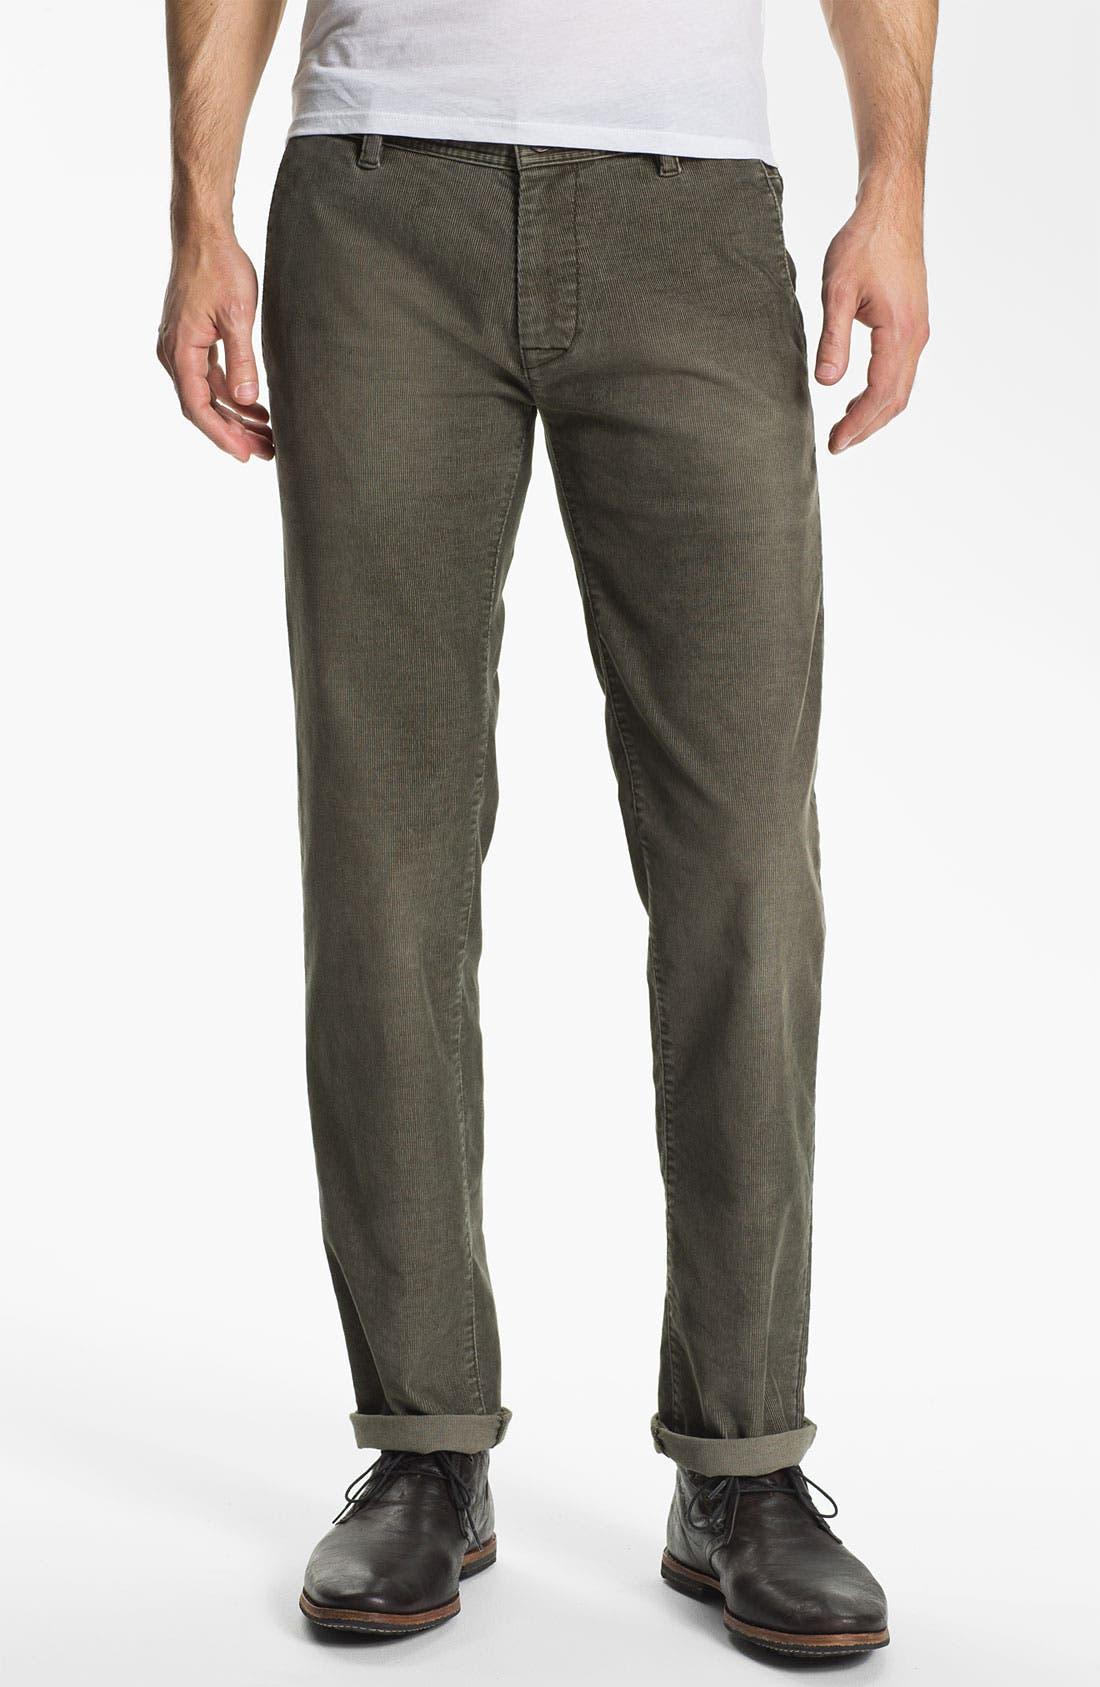 Alternate Image 1 Selected - BOSS Orange Slim Fit Corduroy Pants